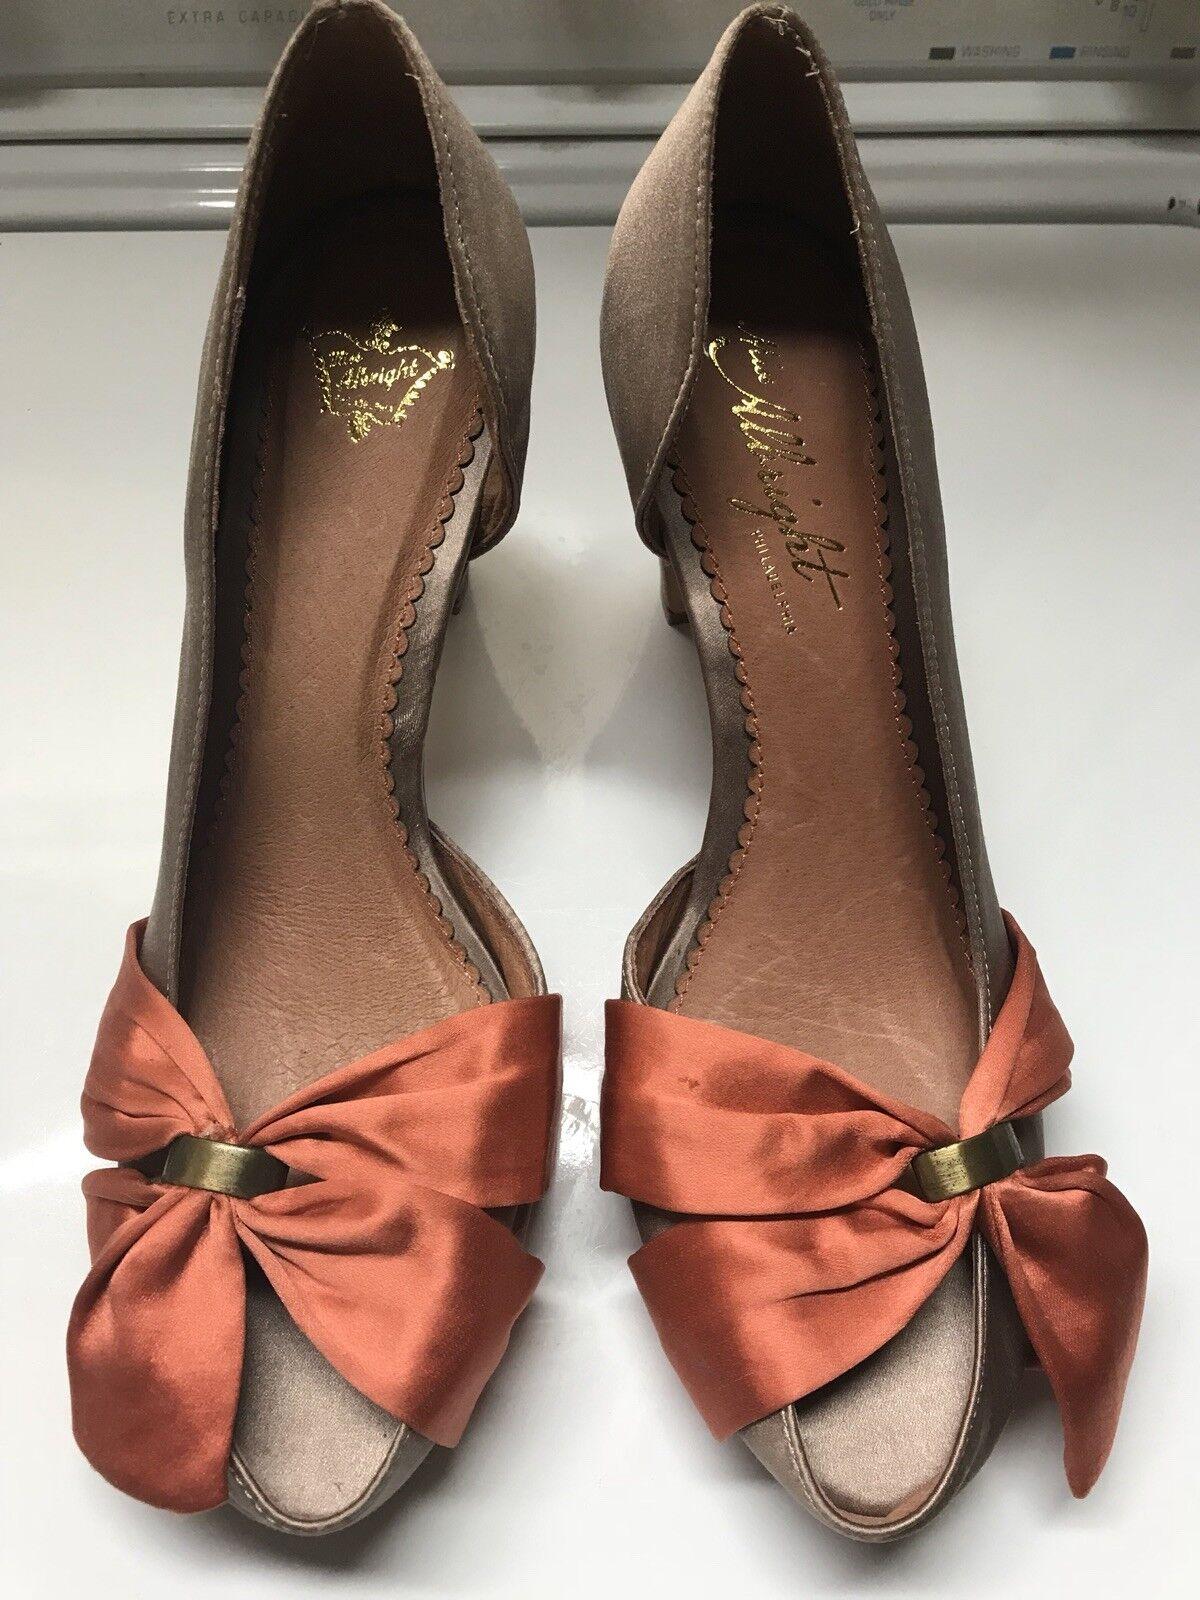 Miss Albright Silky Wedge Pump Peep Toe With Bow Größe 39/8.5